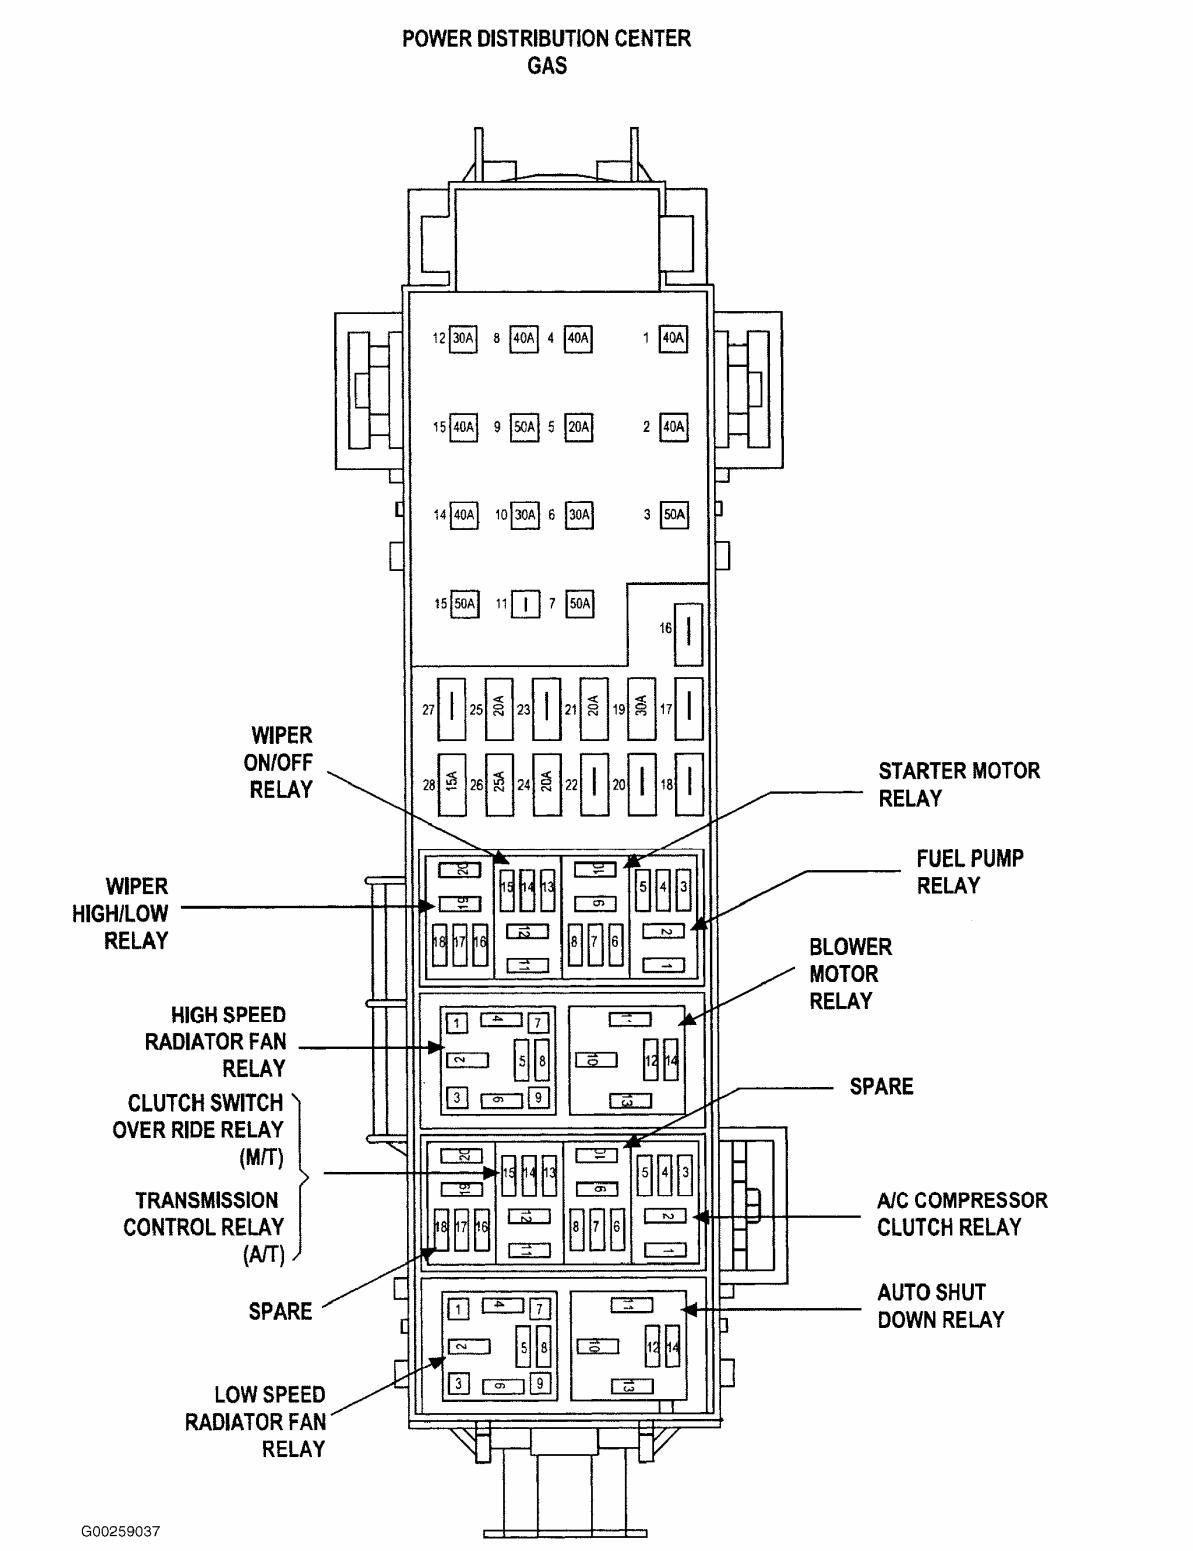 2004 Jeep Liberty Fuse Box Diagram